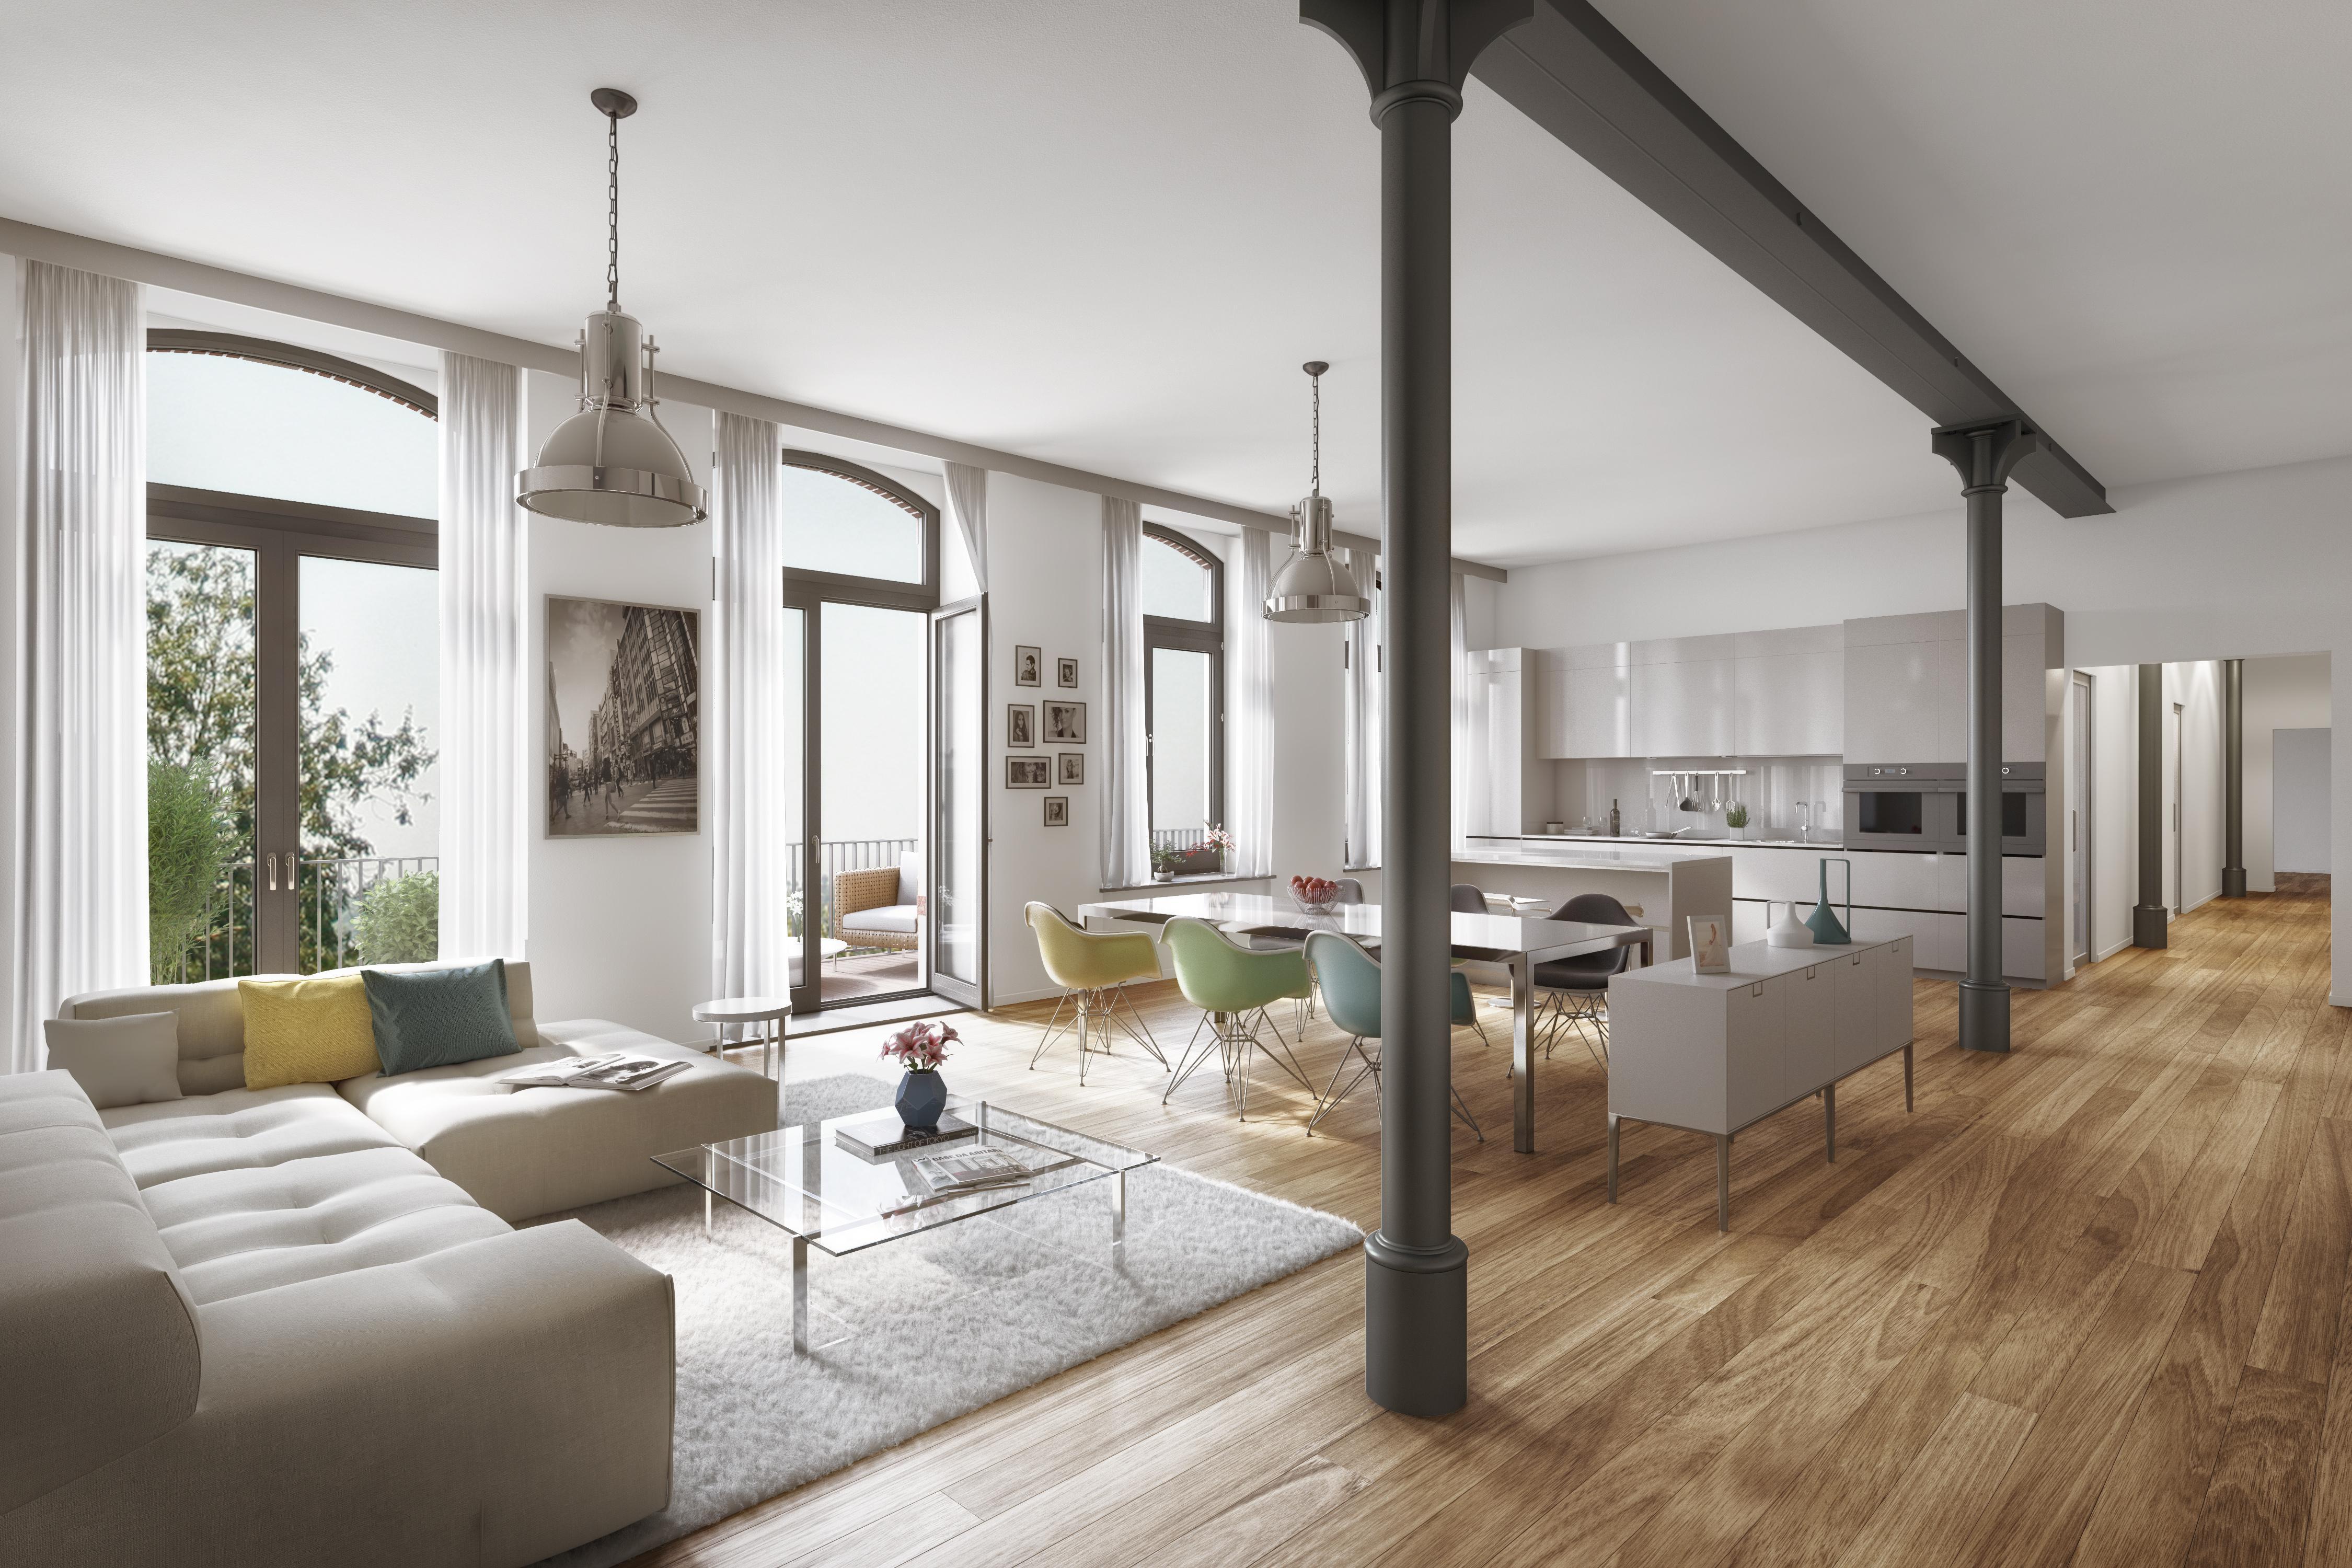 Mai 2017 haus capital immobilien - Seidel architekten ...